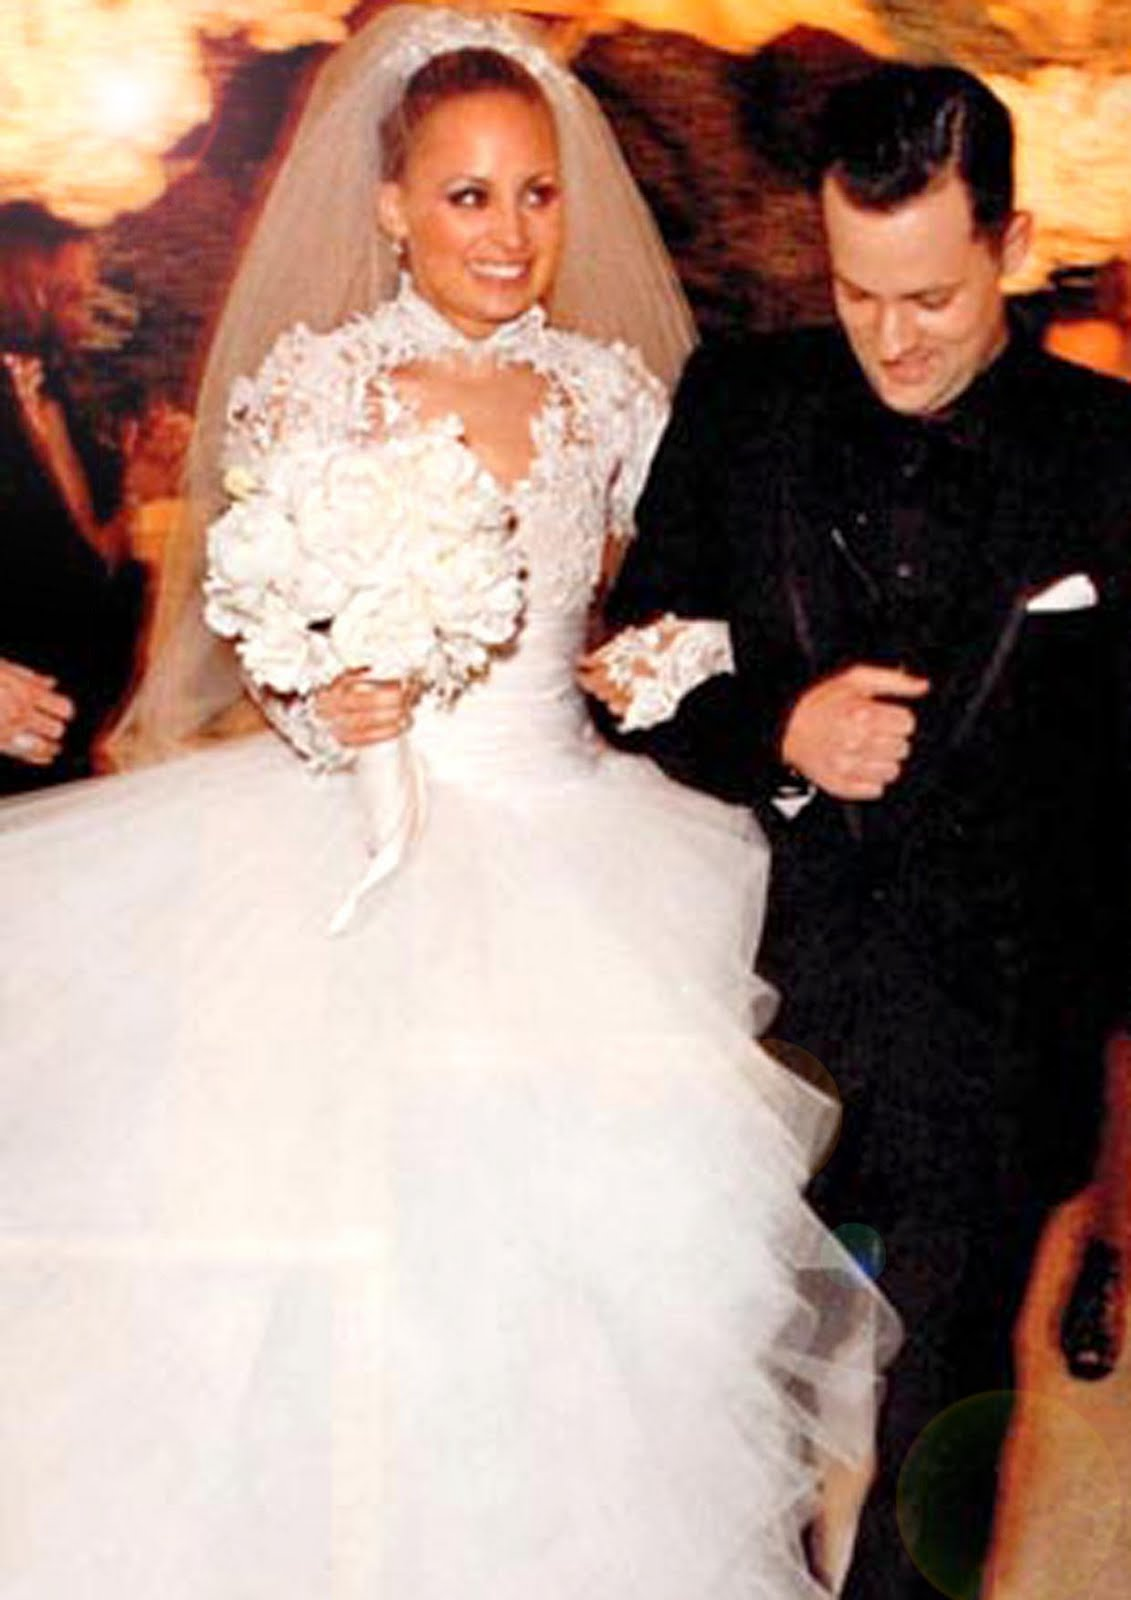 http://4.bp.blogspot.com/_Rzu6SjTr7wY/TSDx4RewnxI/AAAAAAAABpk/6b5Kr0HNjno/s1600/Nicole_Richie_wedding_Dress.jpg